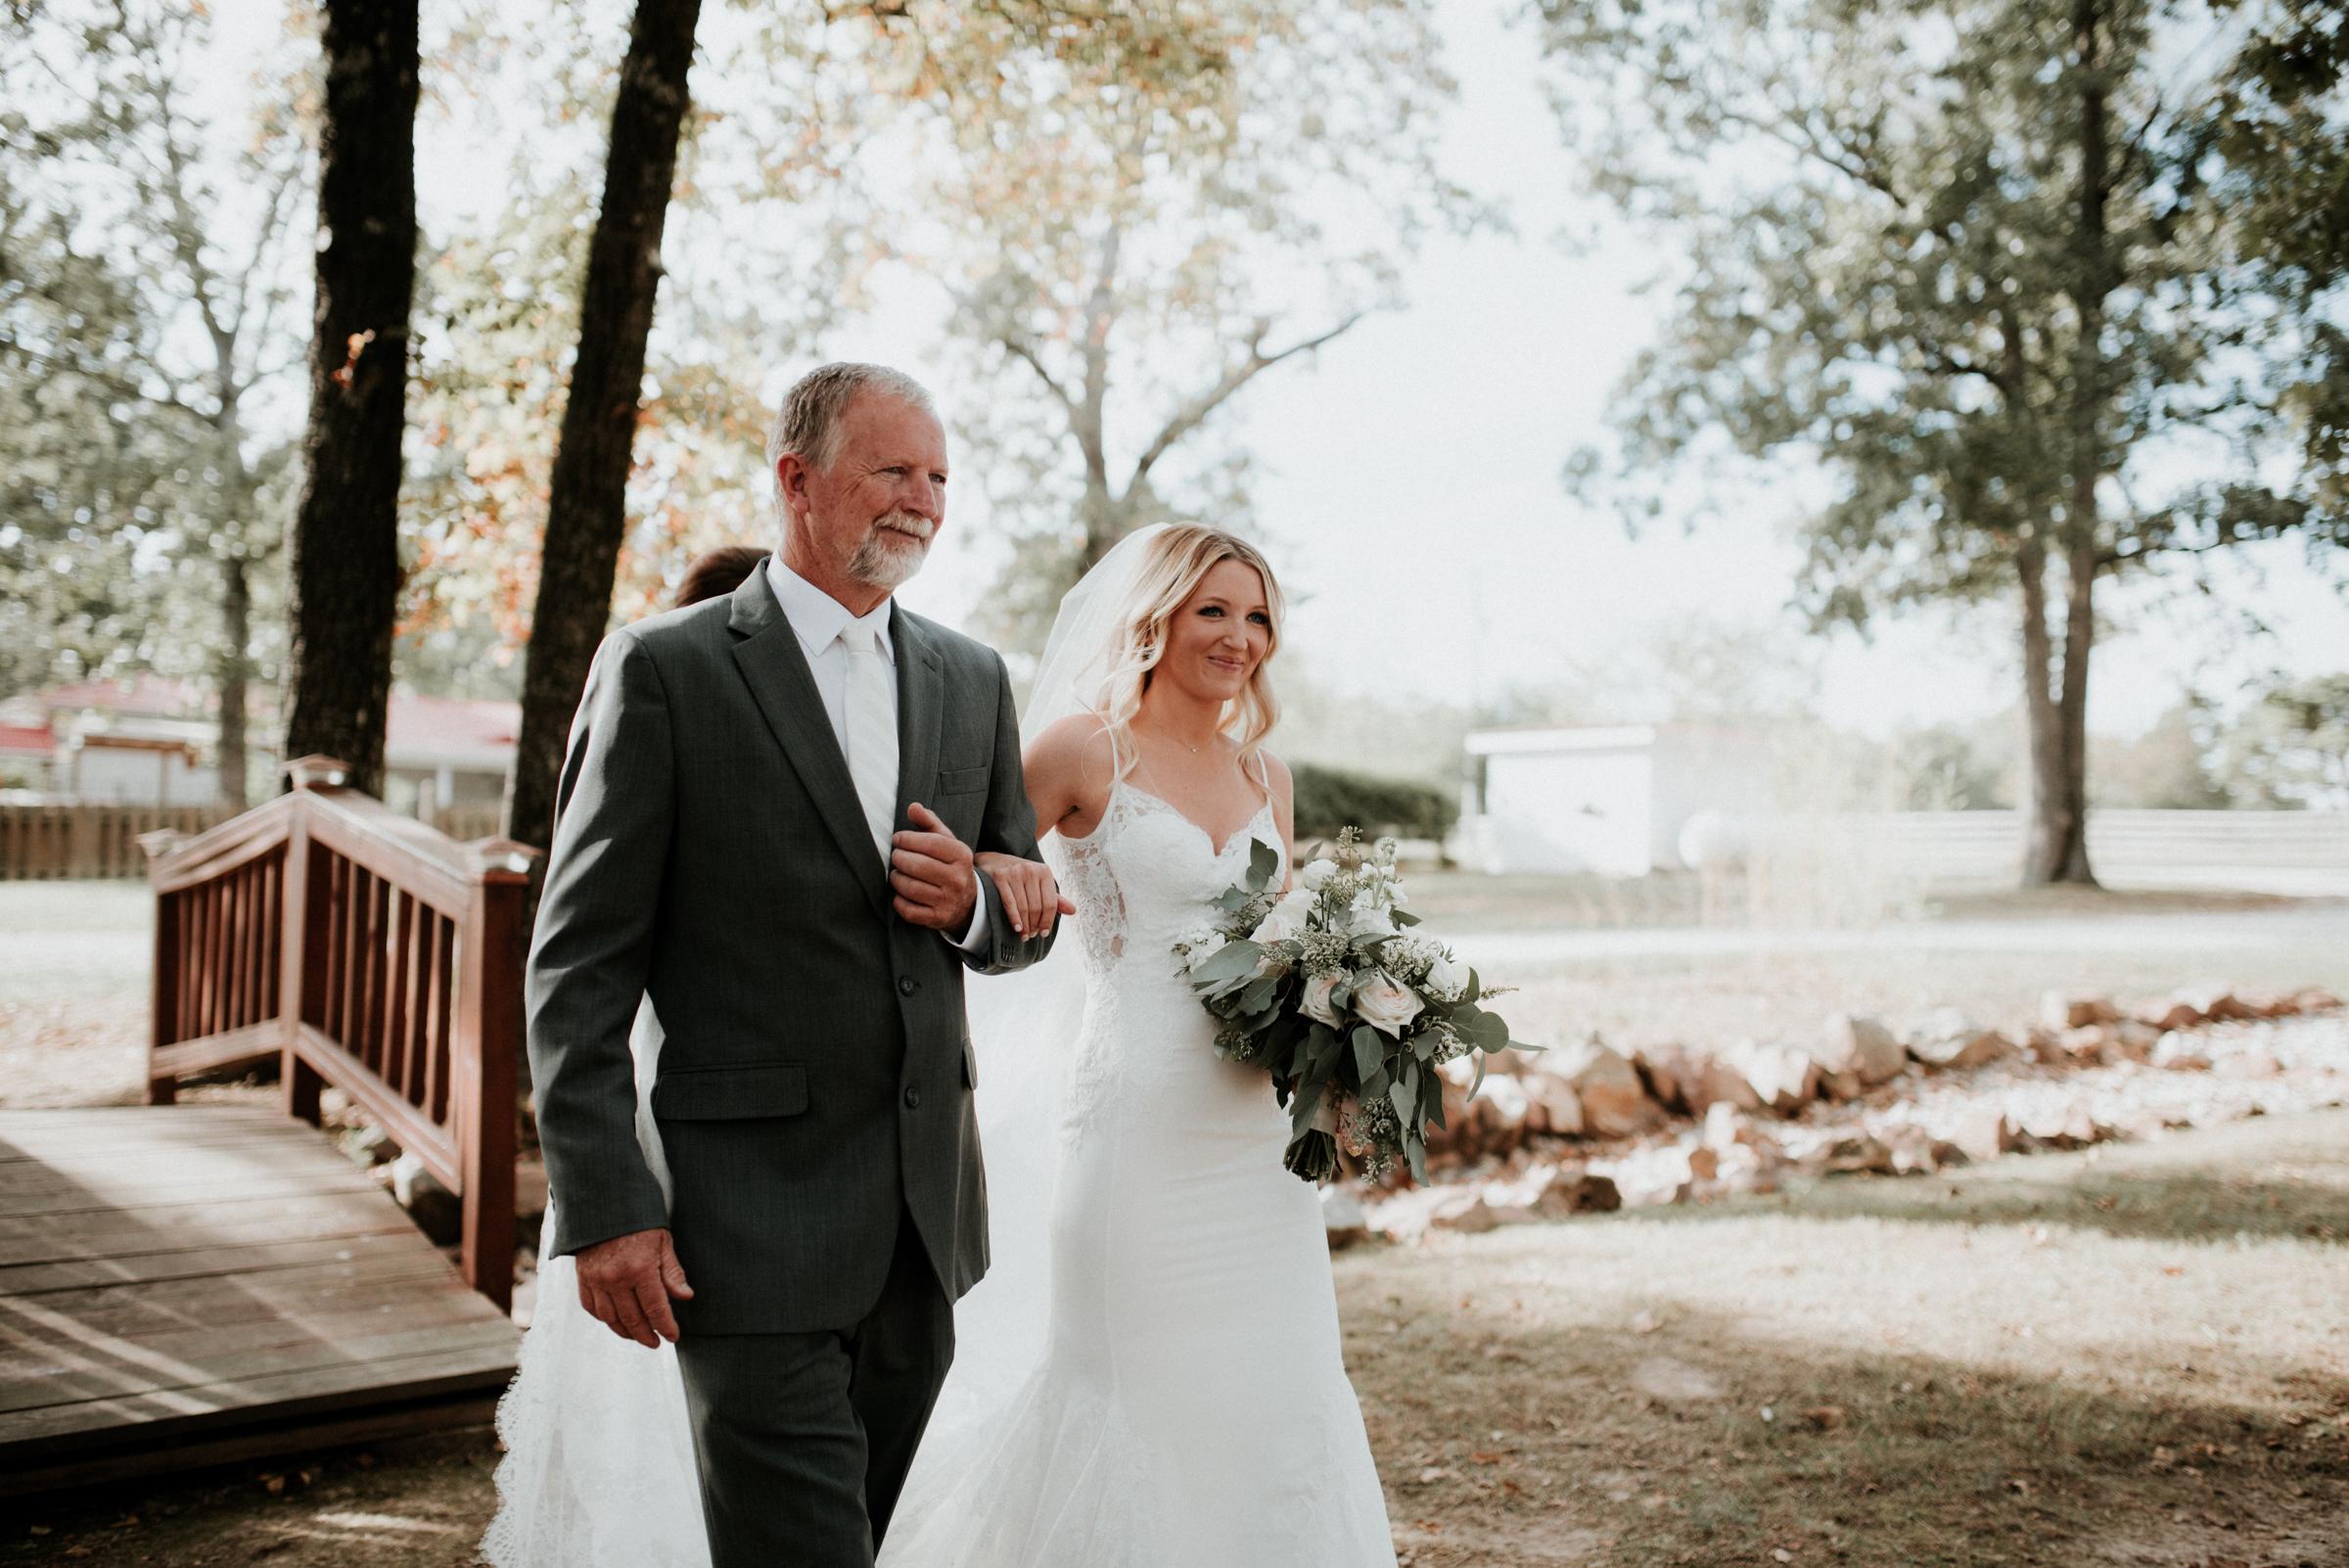 Zach&Rosalie Marion St. Louis Wedding Photographer-9969.jpg